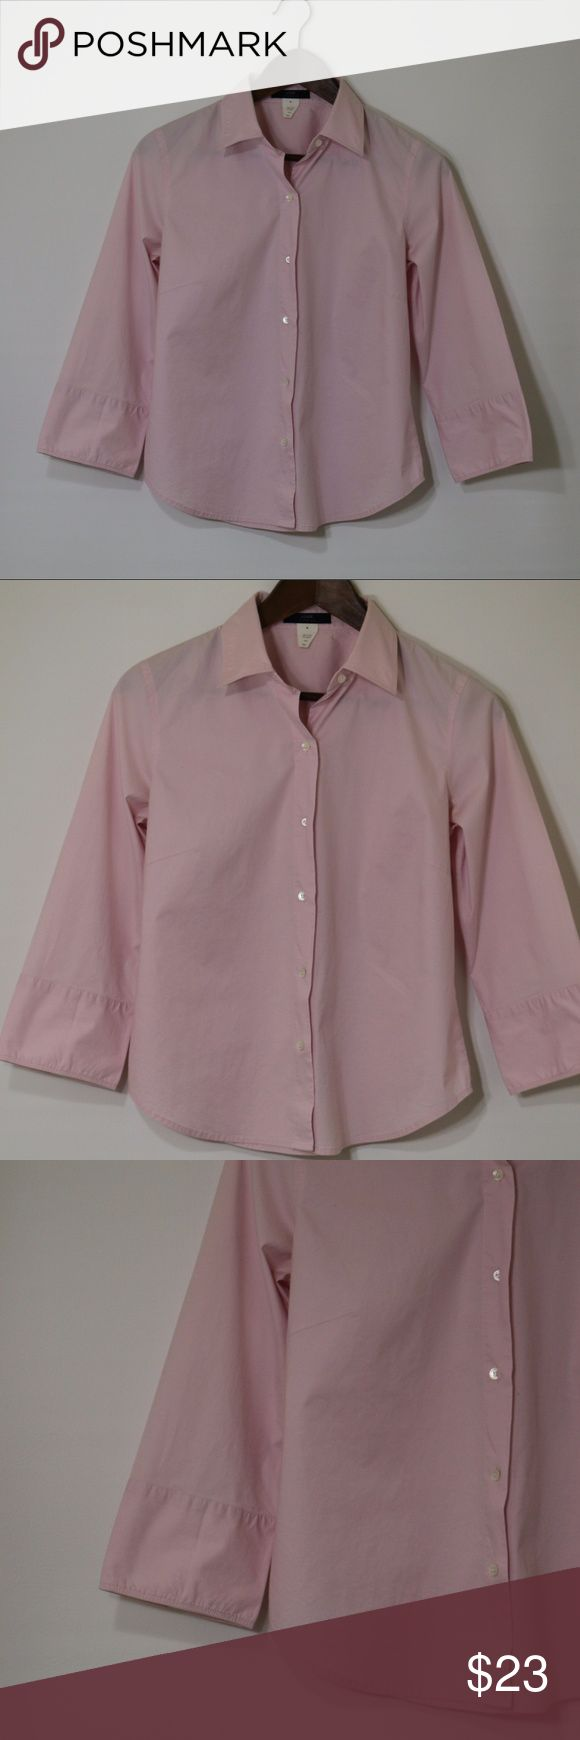 J.Crew button down pink polo shirt J.Crew button down pink polo shirt 98%cotton 2%spandex made in china  B-79 J.Crew Tops Button Down Shirts